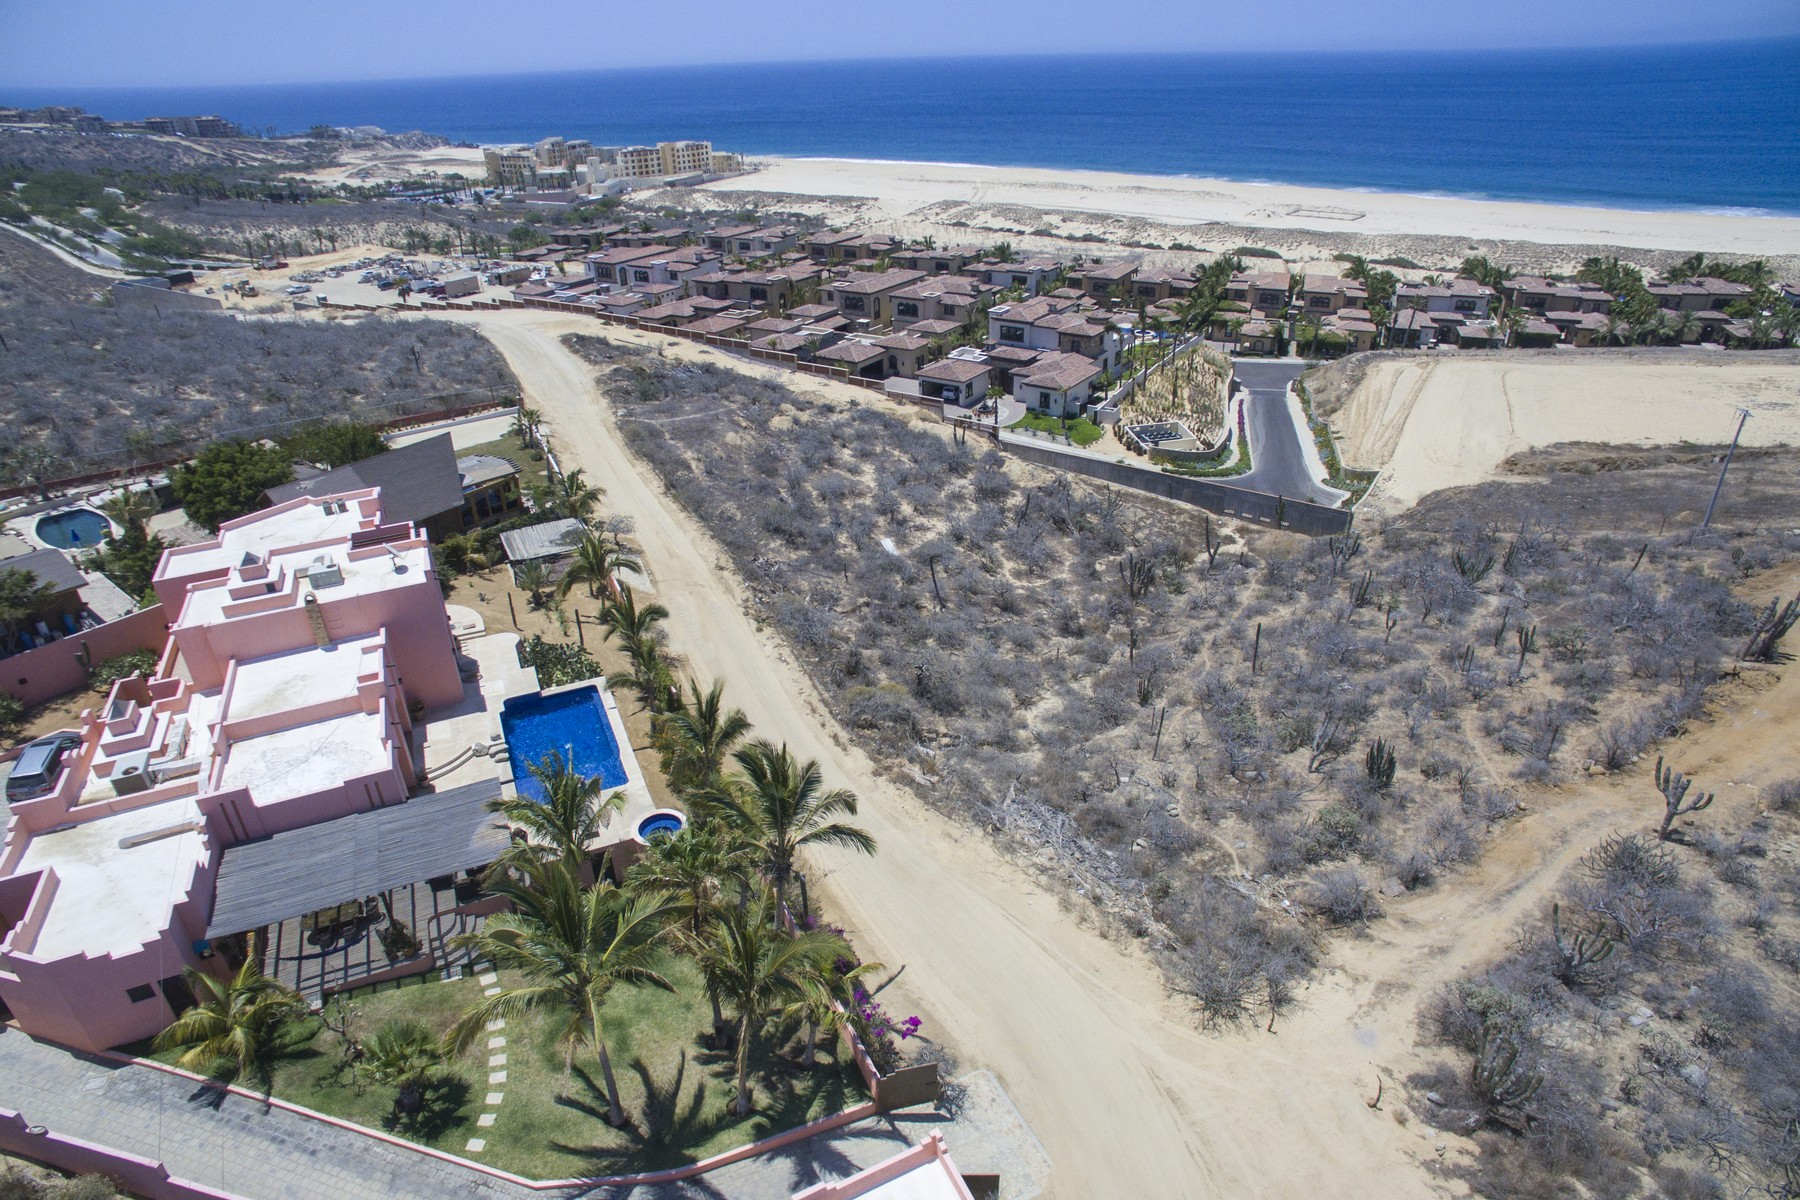 Land for Sale at La Laguna Lot Balcones del Pacifico Cabo San Lucas, Baja California Sur 23456 Mexico